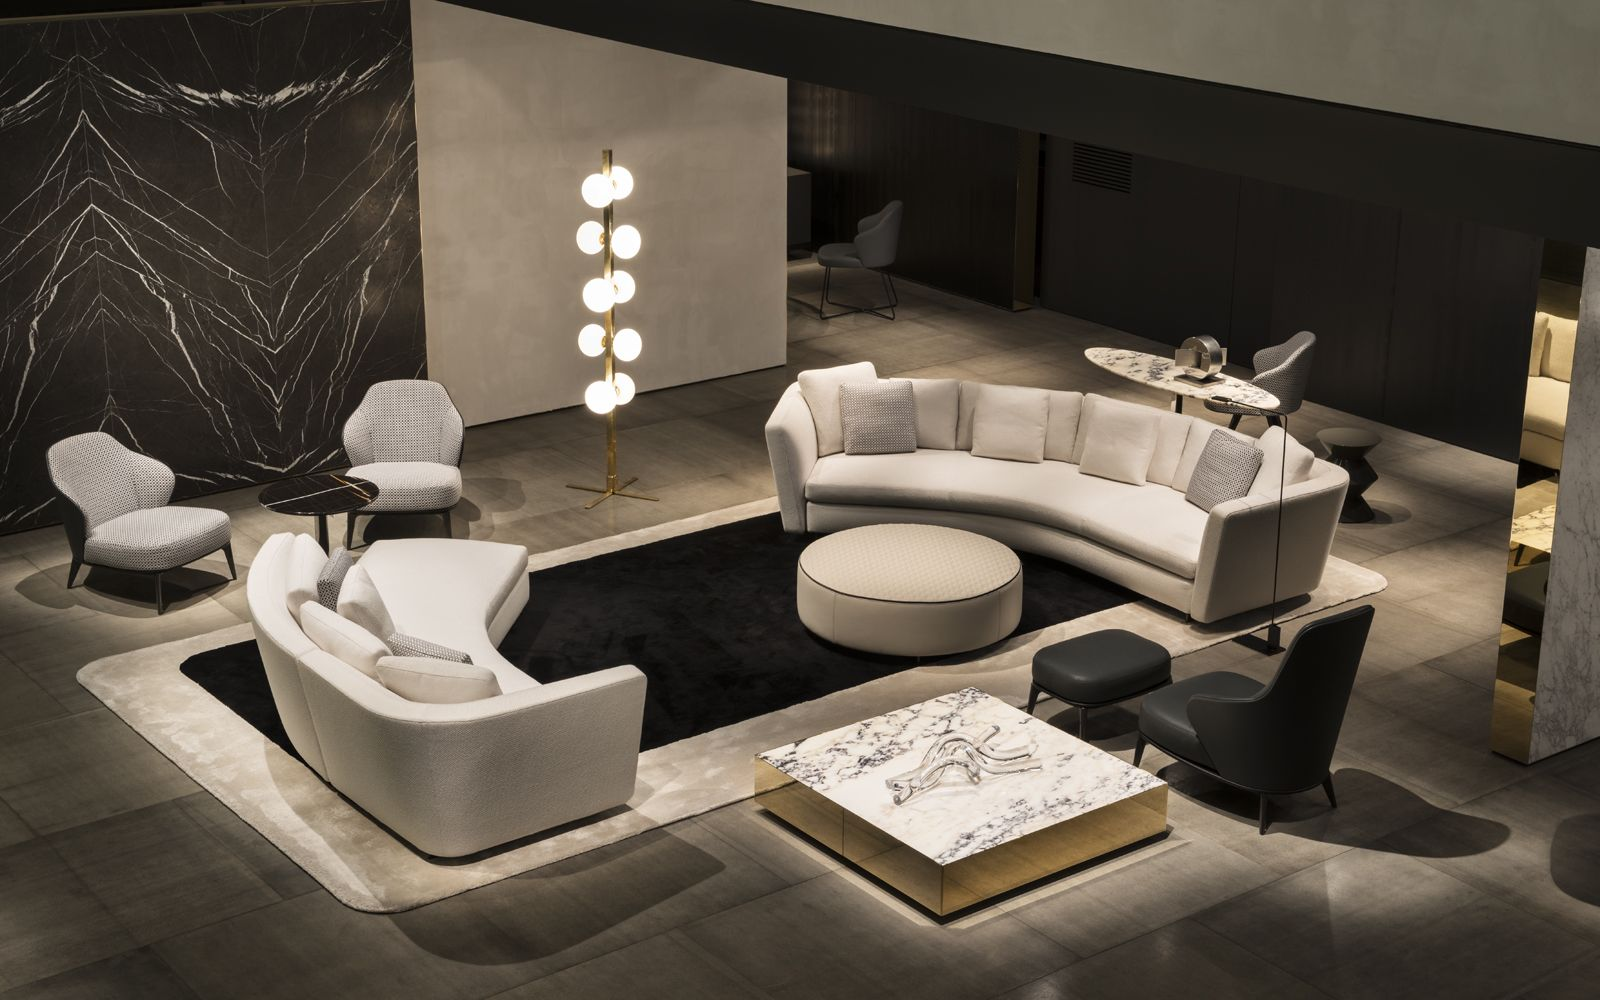 Seymour seating system leslie armchairs and elliott coffee table rodolfo dordoni design - Divano curvo design ...